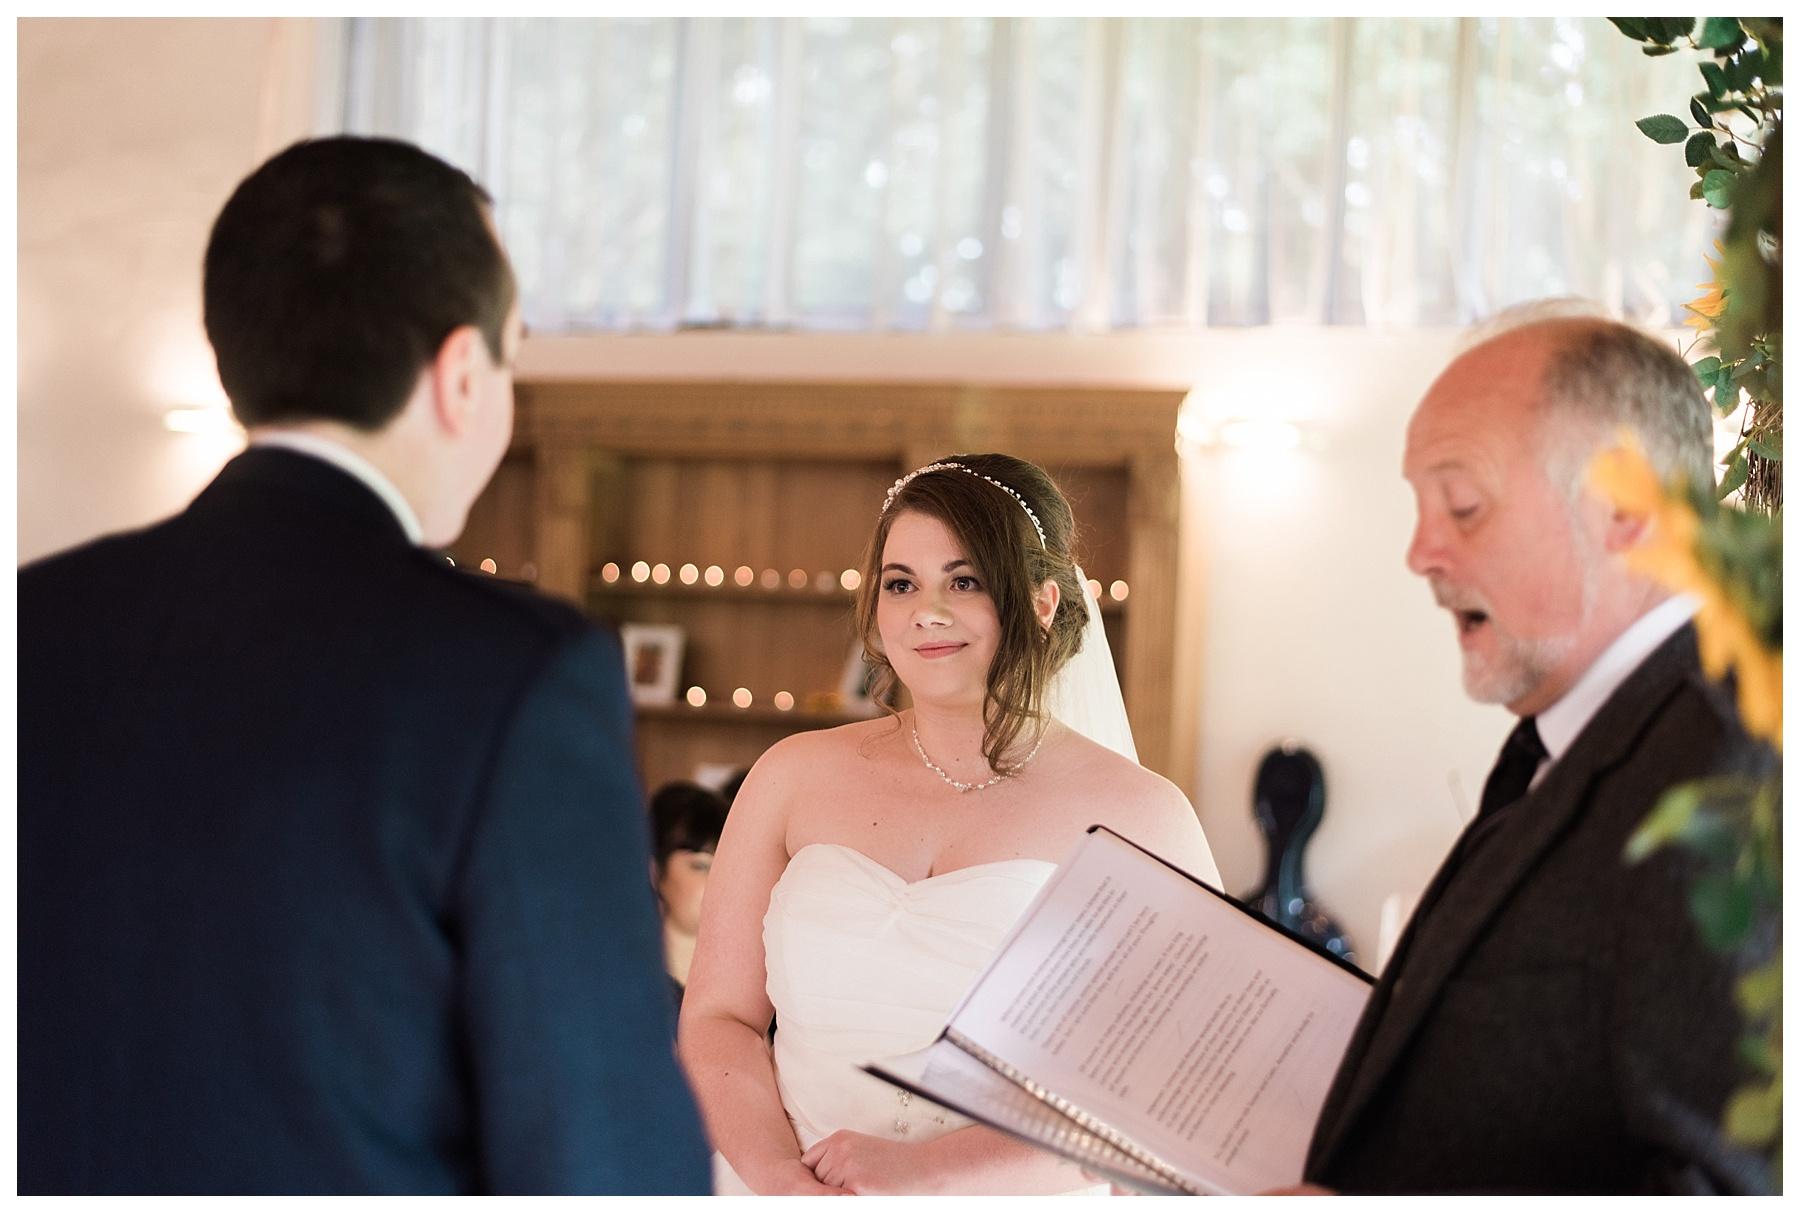 2018-01-29_0020.jpgCarberry Tower Wedding by Edinburgh Wedding Photographer